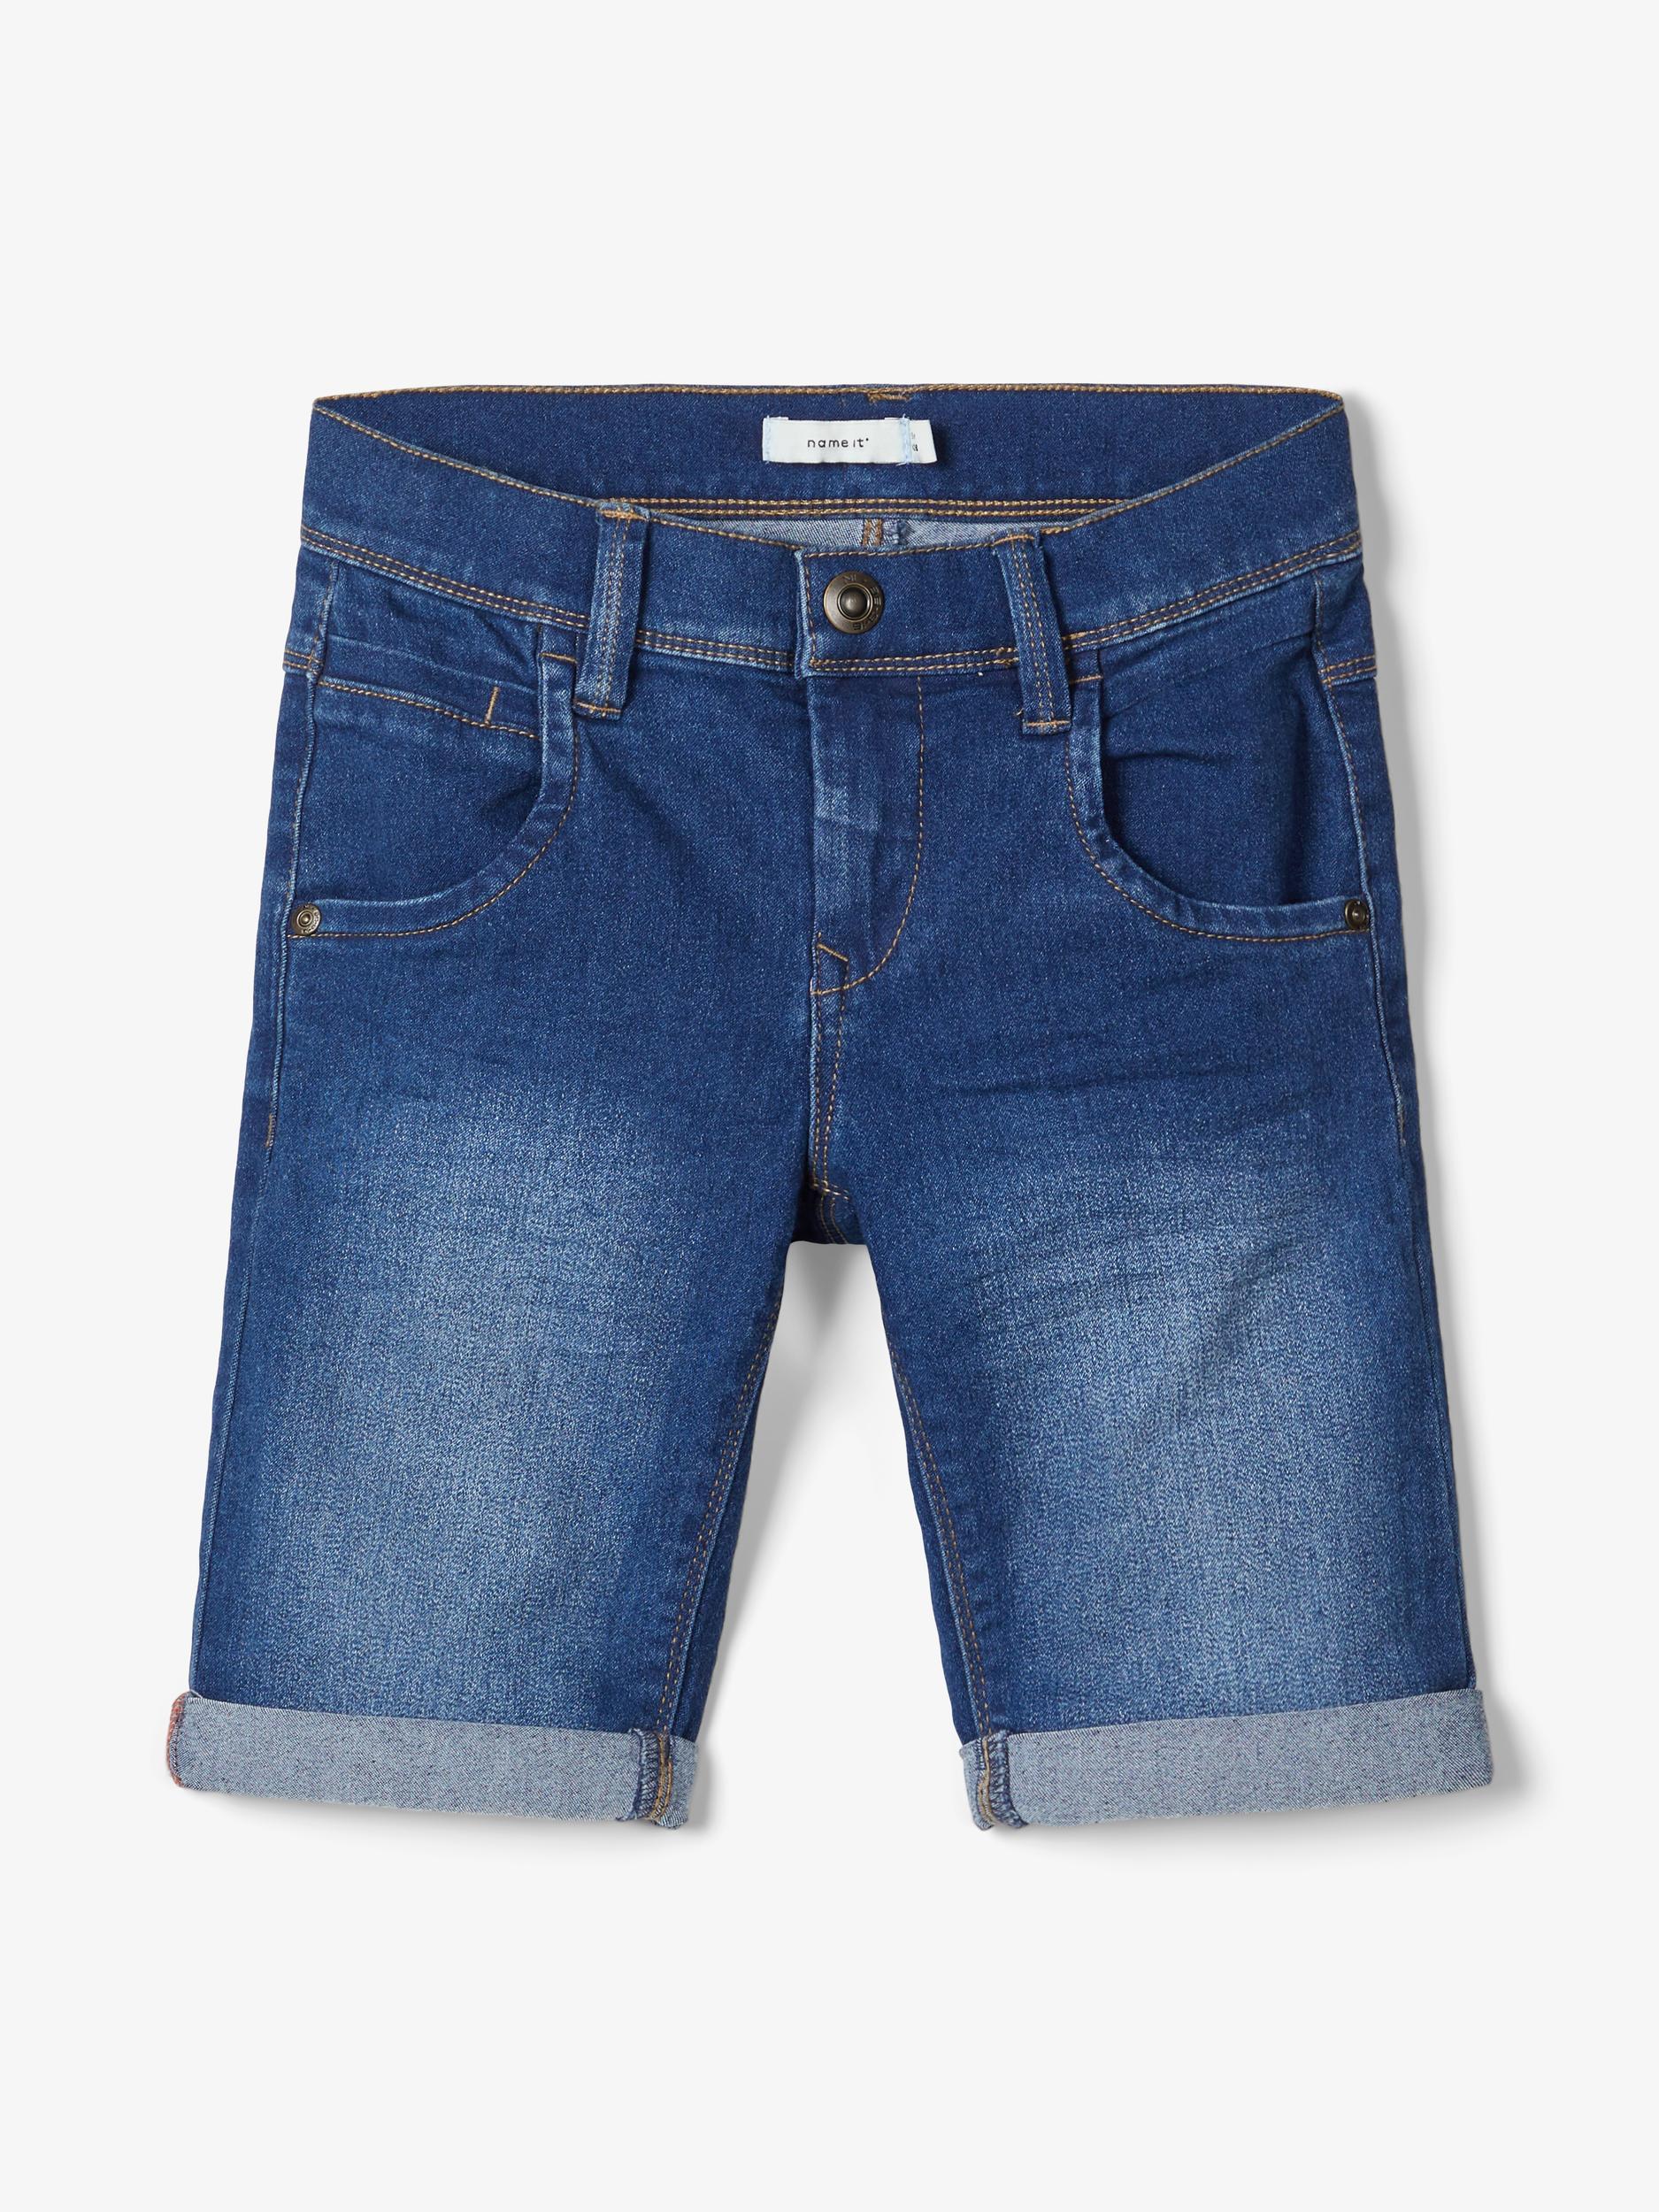 Name It Sofus lange shorts, medium blue denim, 116